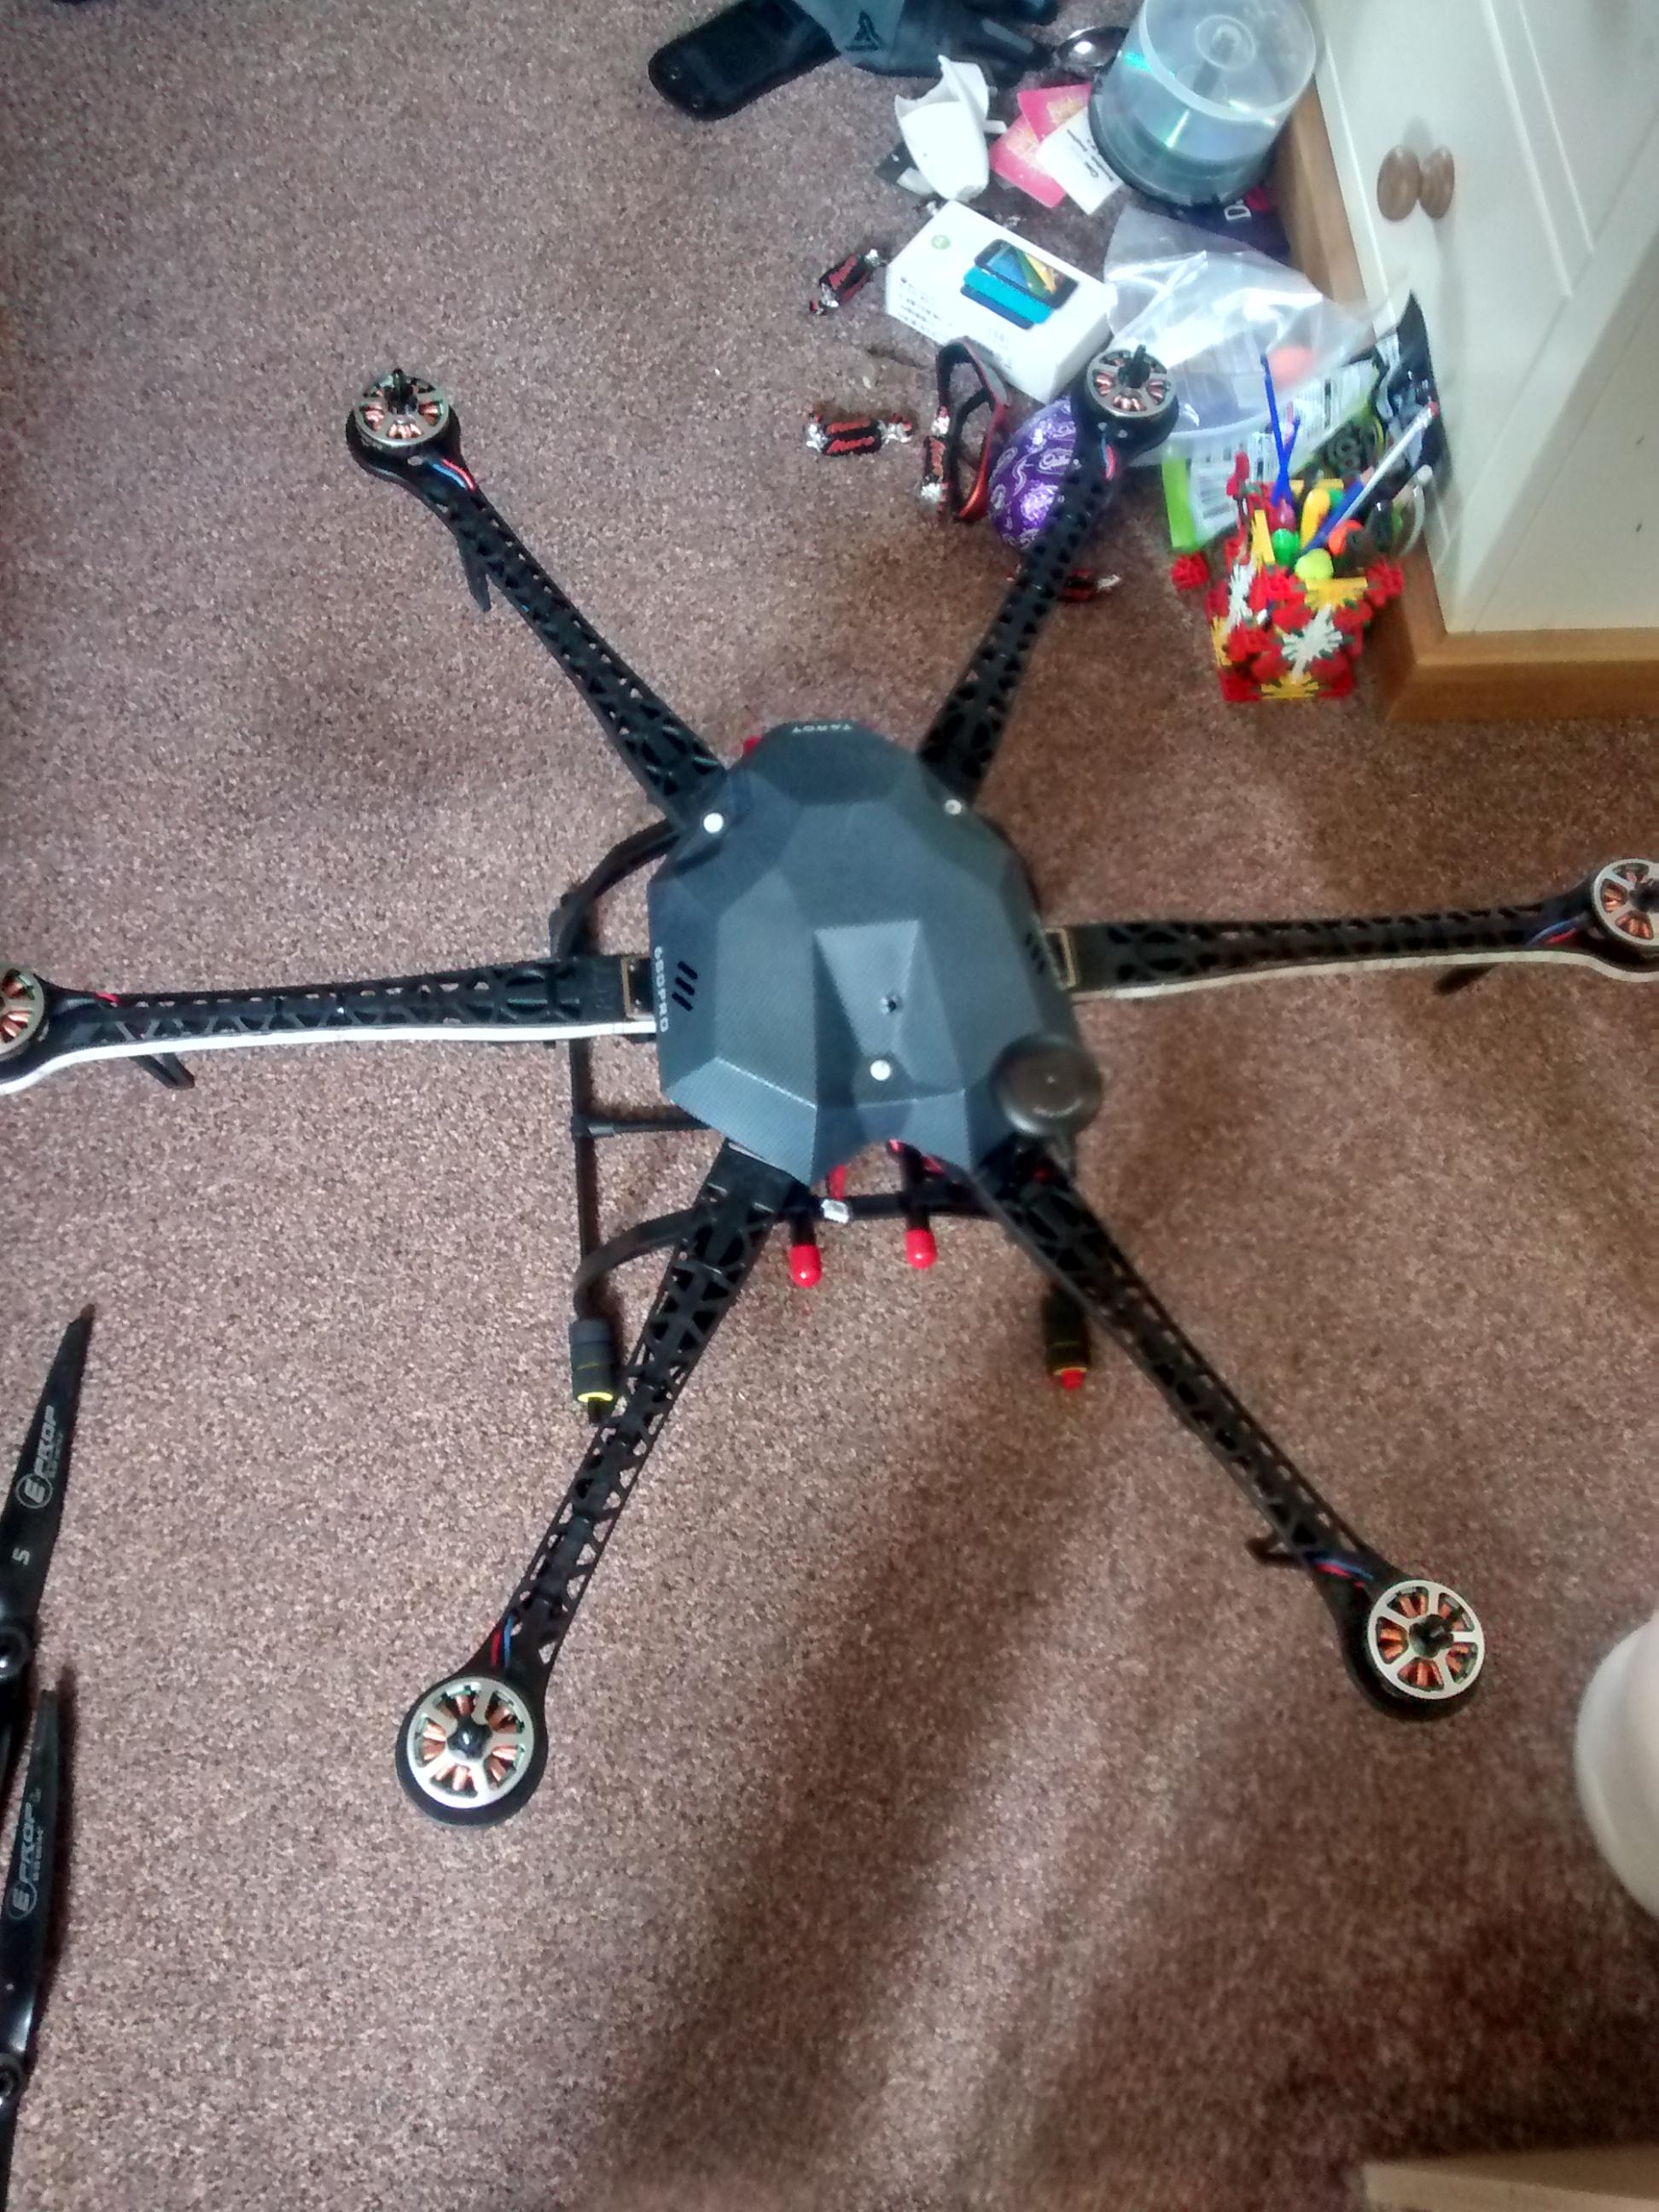 Help please, Hexacopter wont lift off | FliteTest Forum